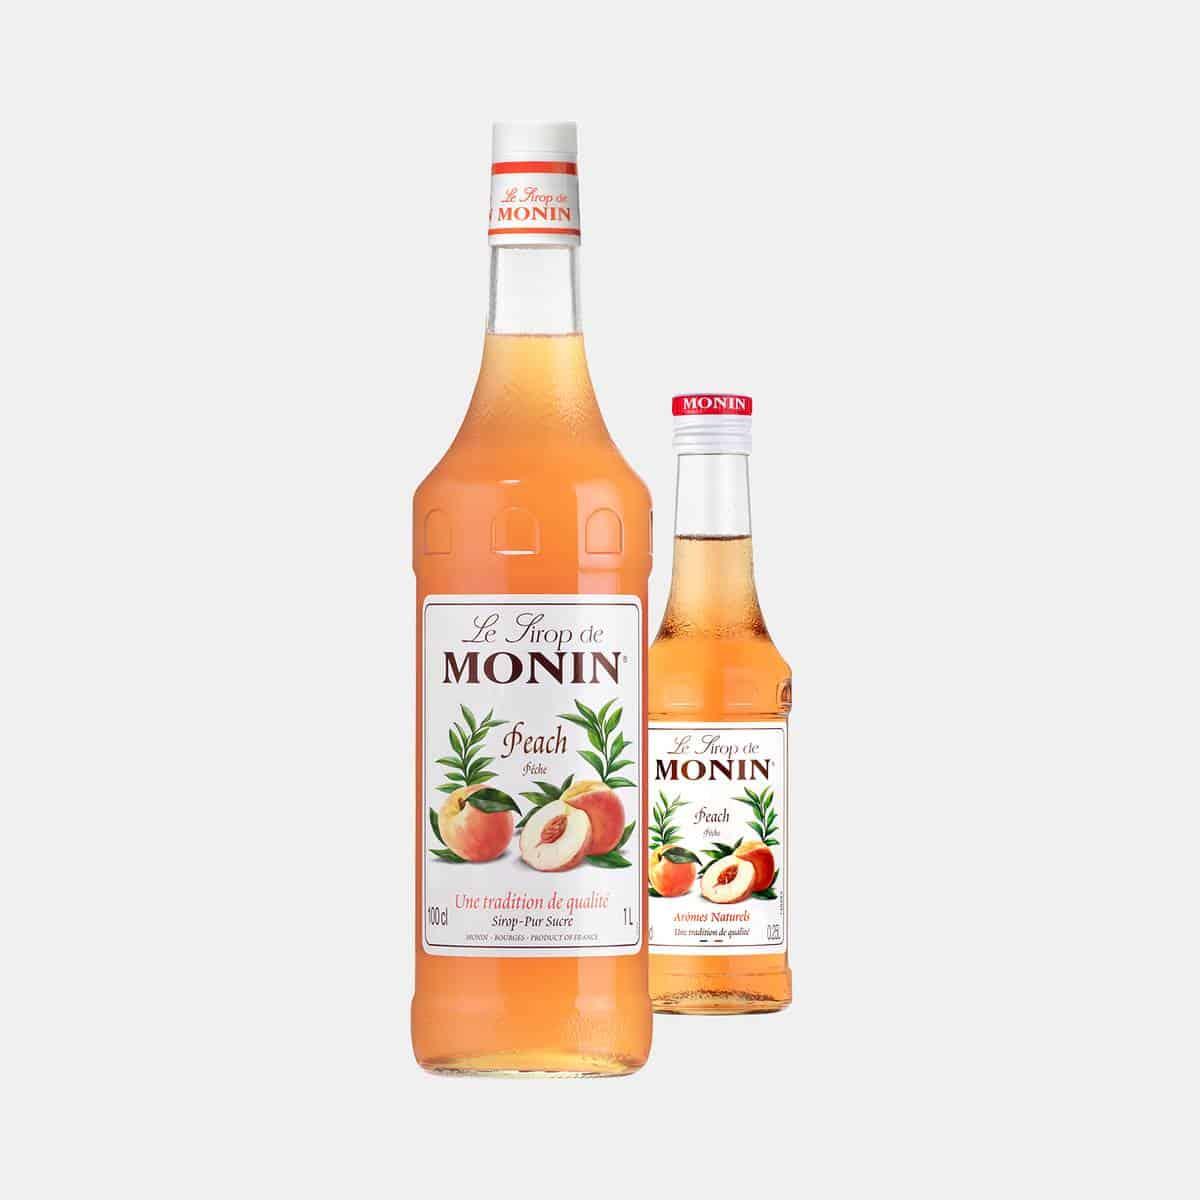 Monin Peach Syrup Glass Bottles